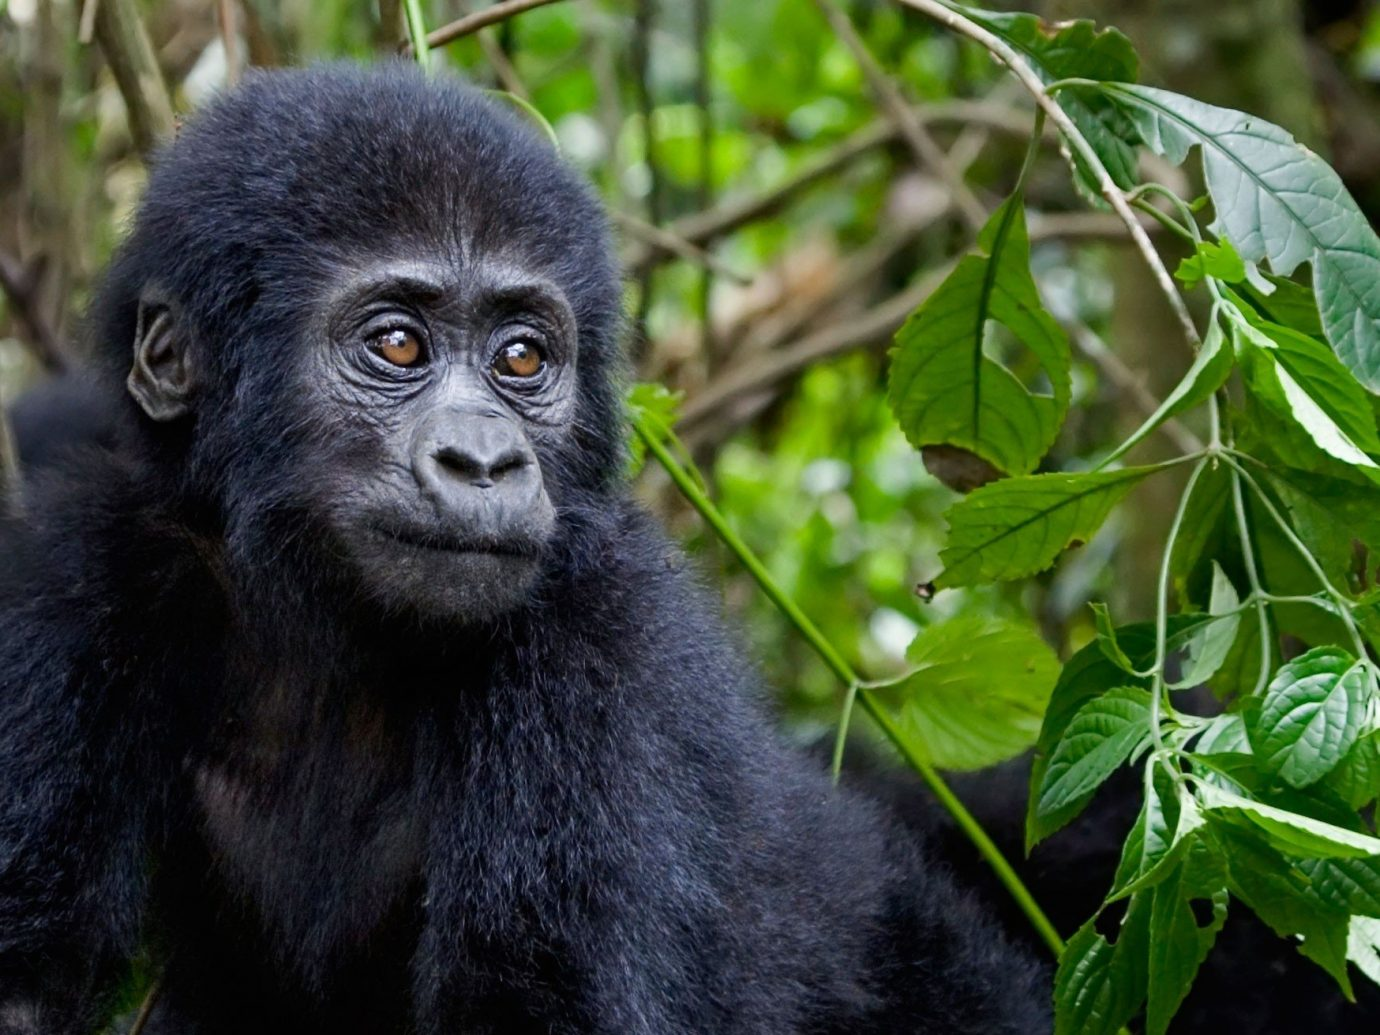 Trip Ideas mammal primate animal tree outdoor western gorilla black vertebrate great ape plant Wildlife fauna ape chimpanzee new world monkey common chimpanzee zoo Jungle